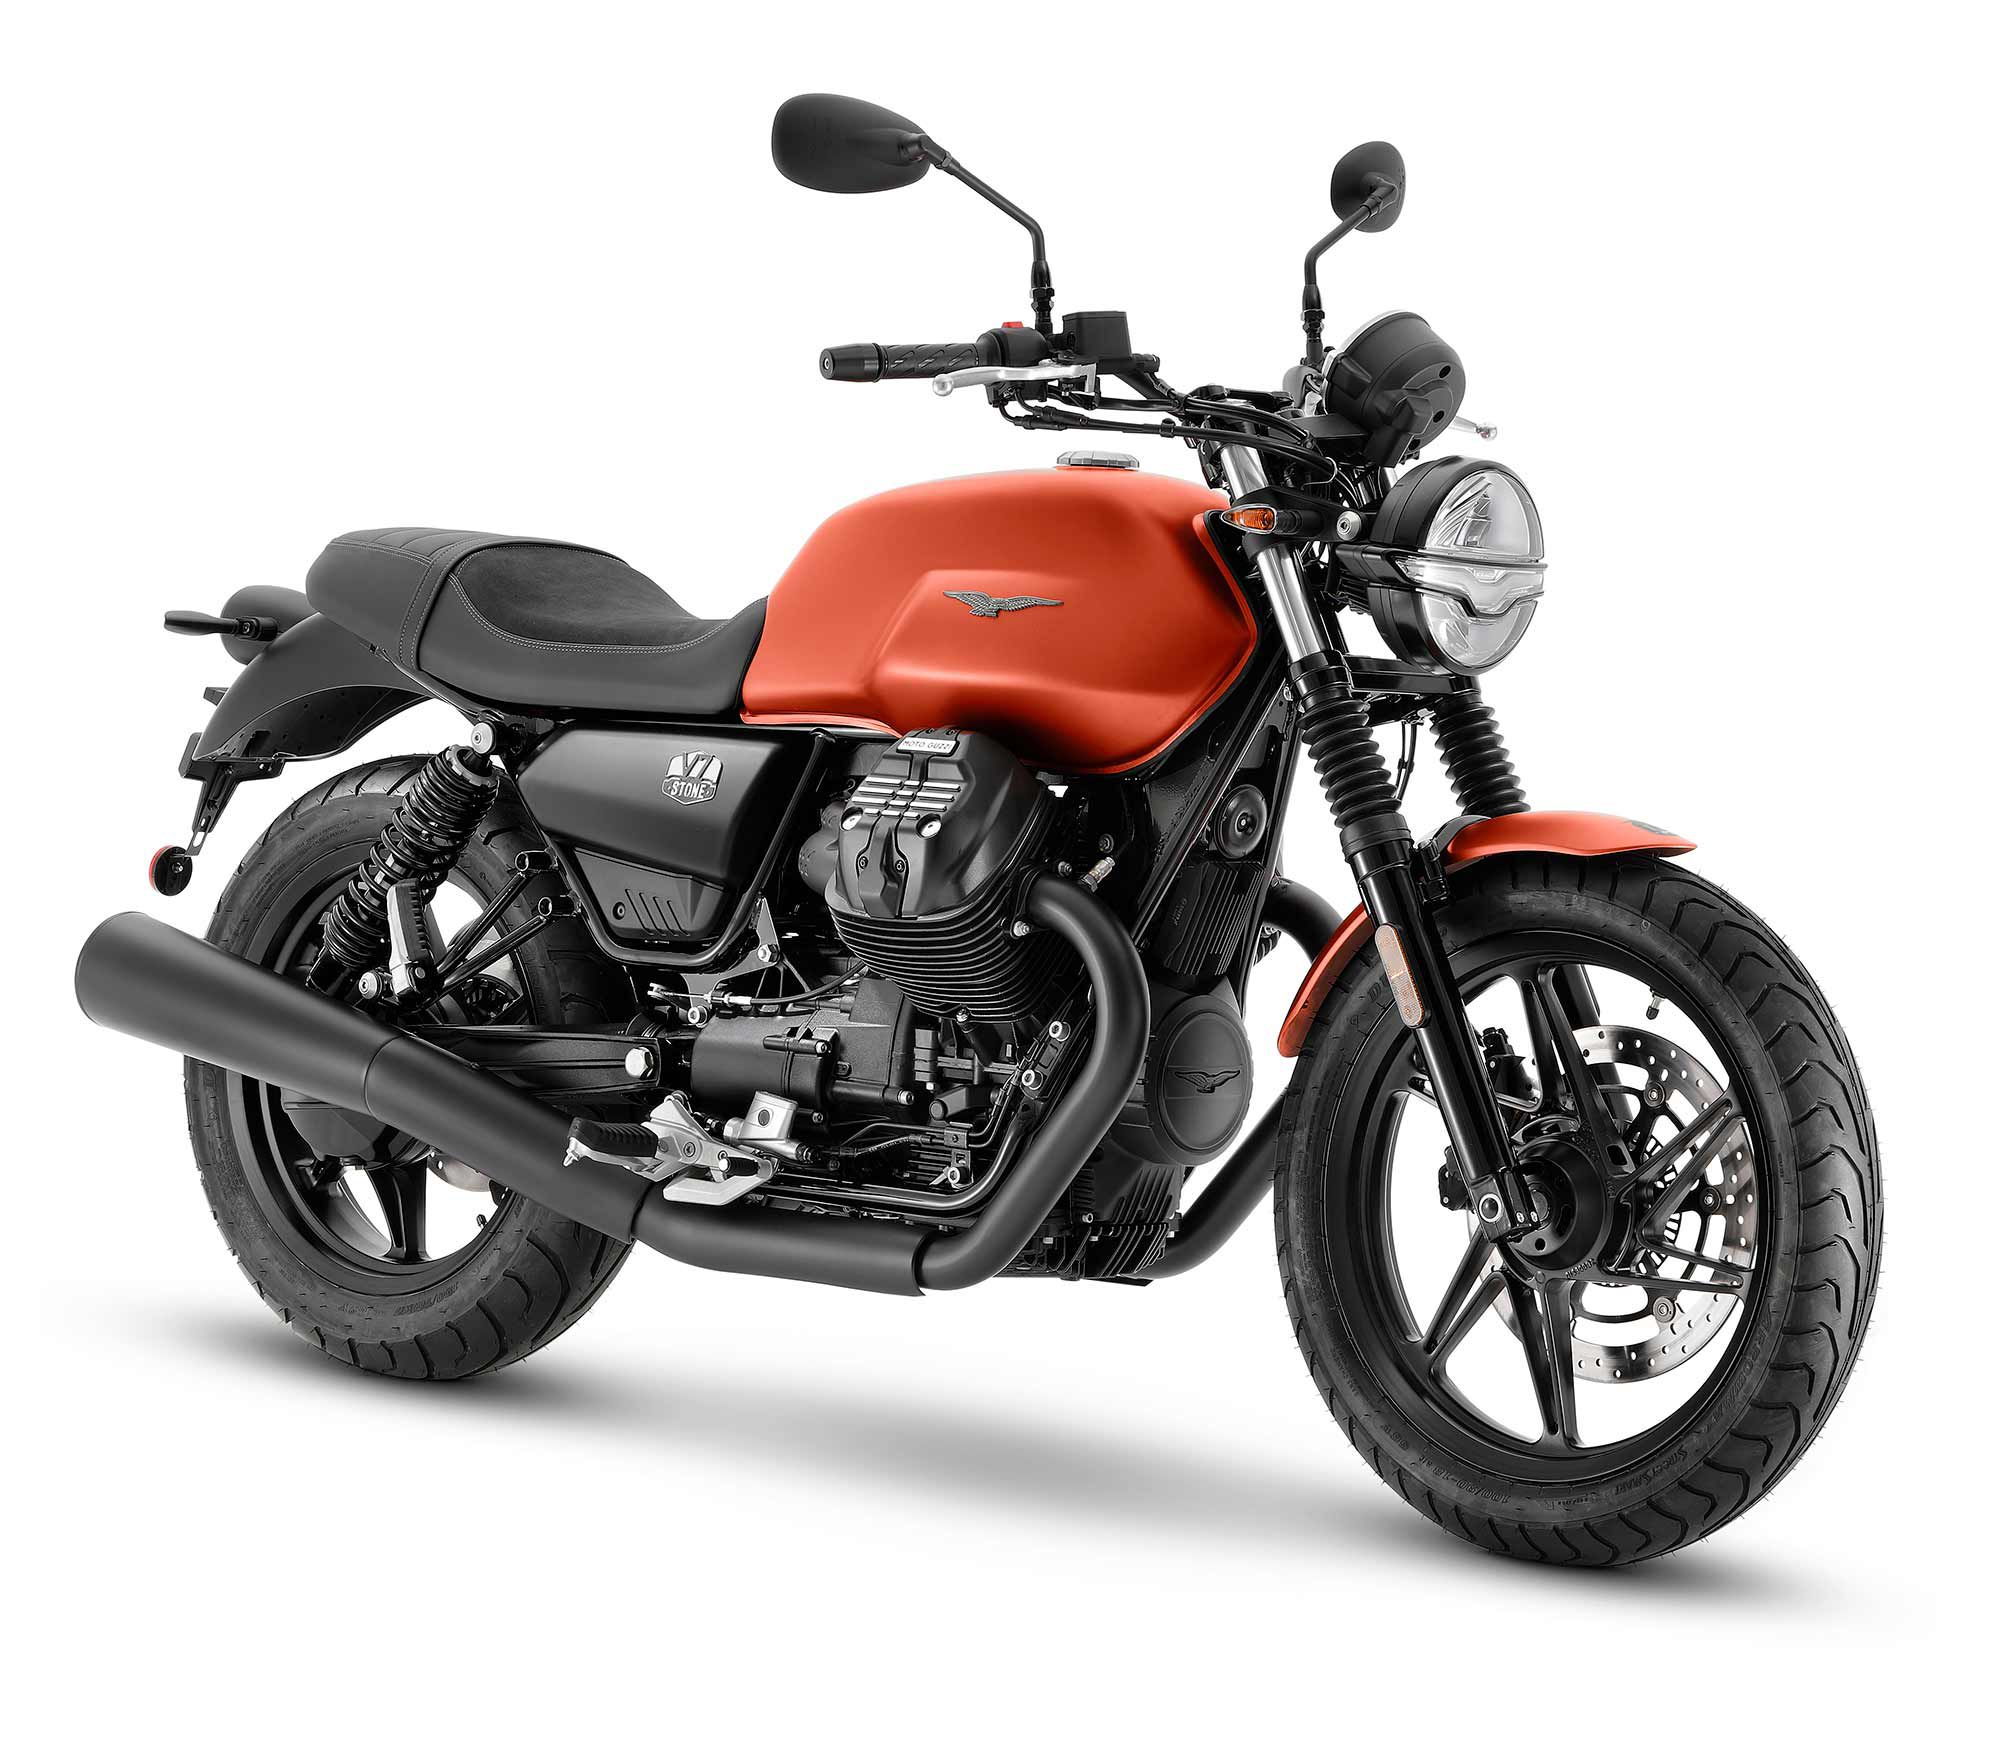 2021 Moto Guzzi V7 Stone (Arancione Rame).